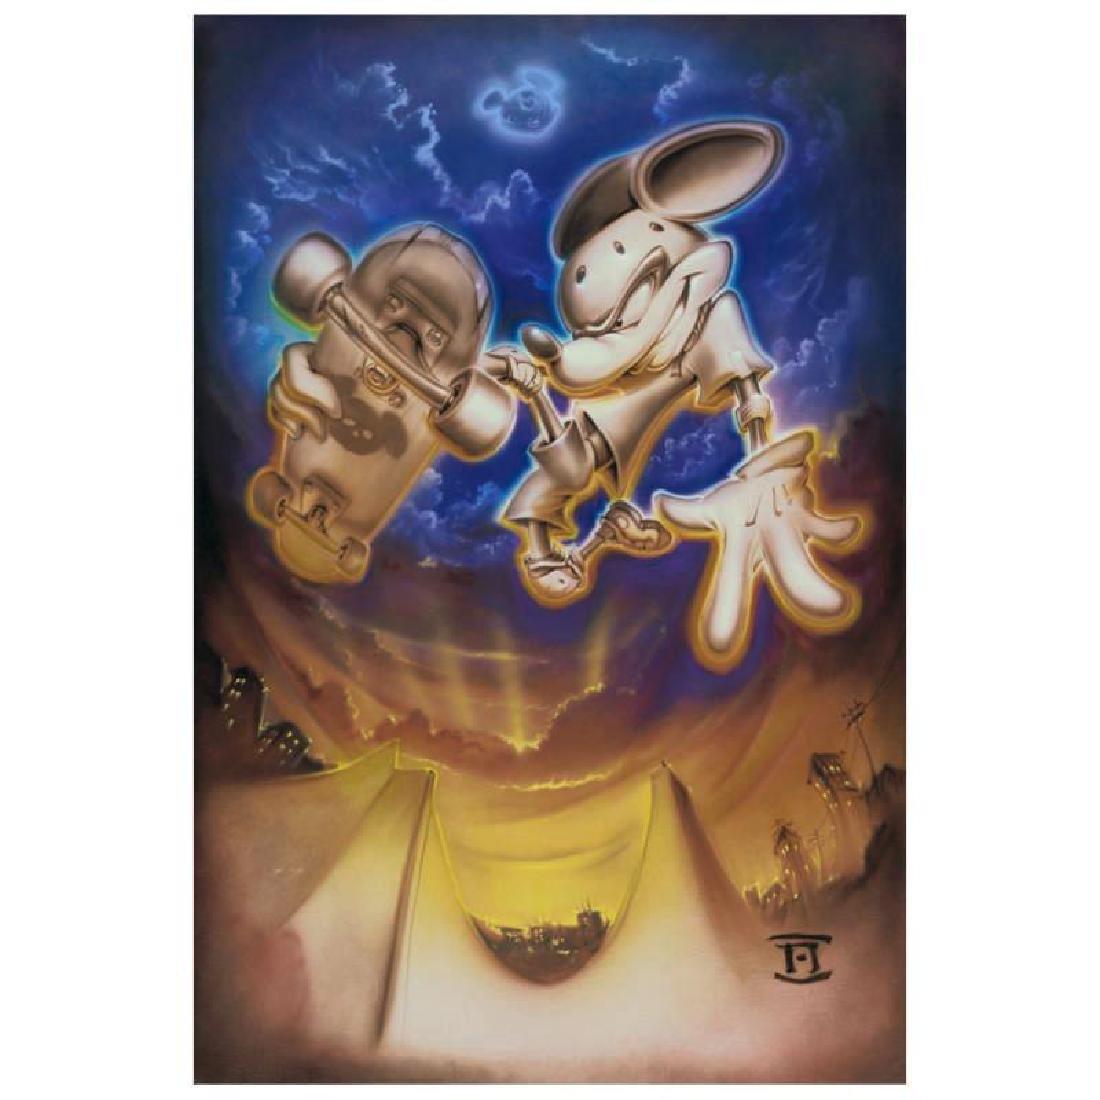 Grind Mouse by Noah